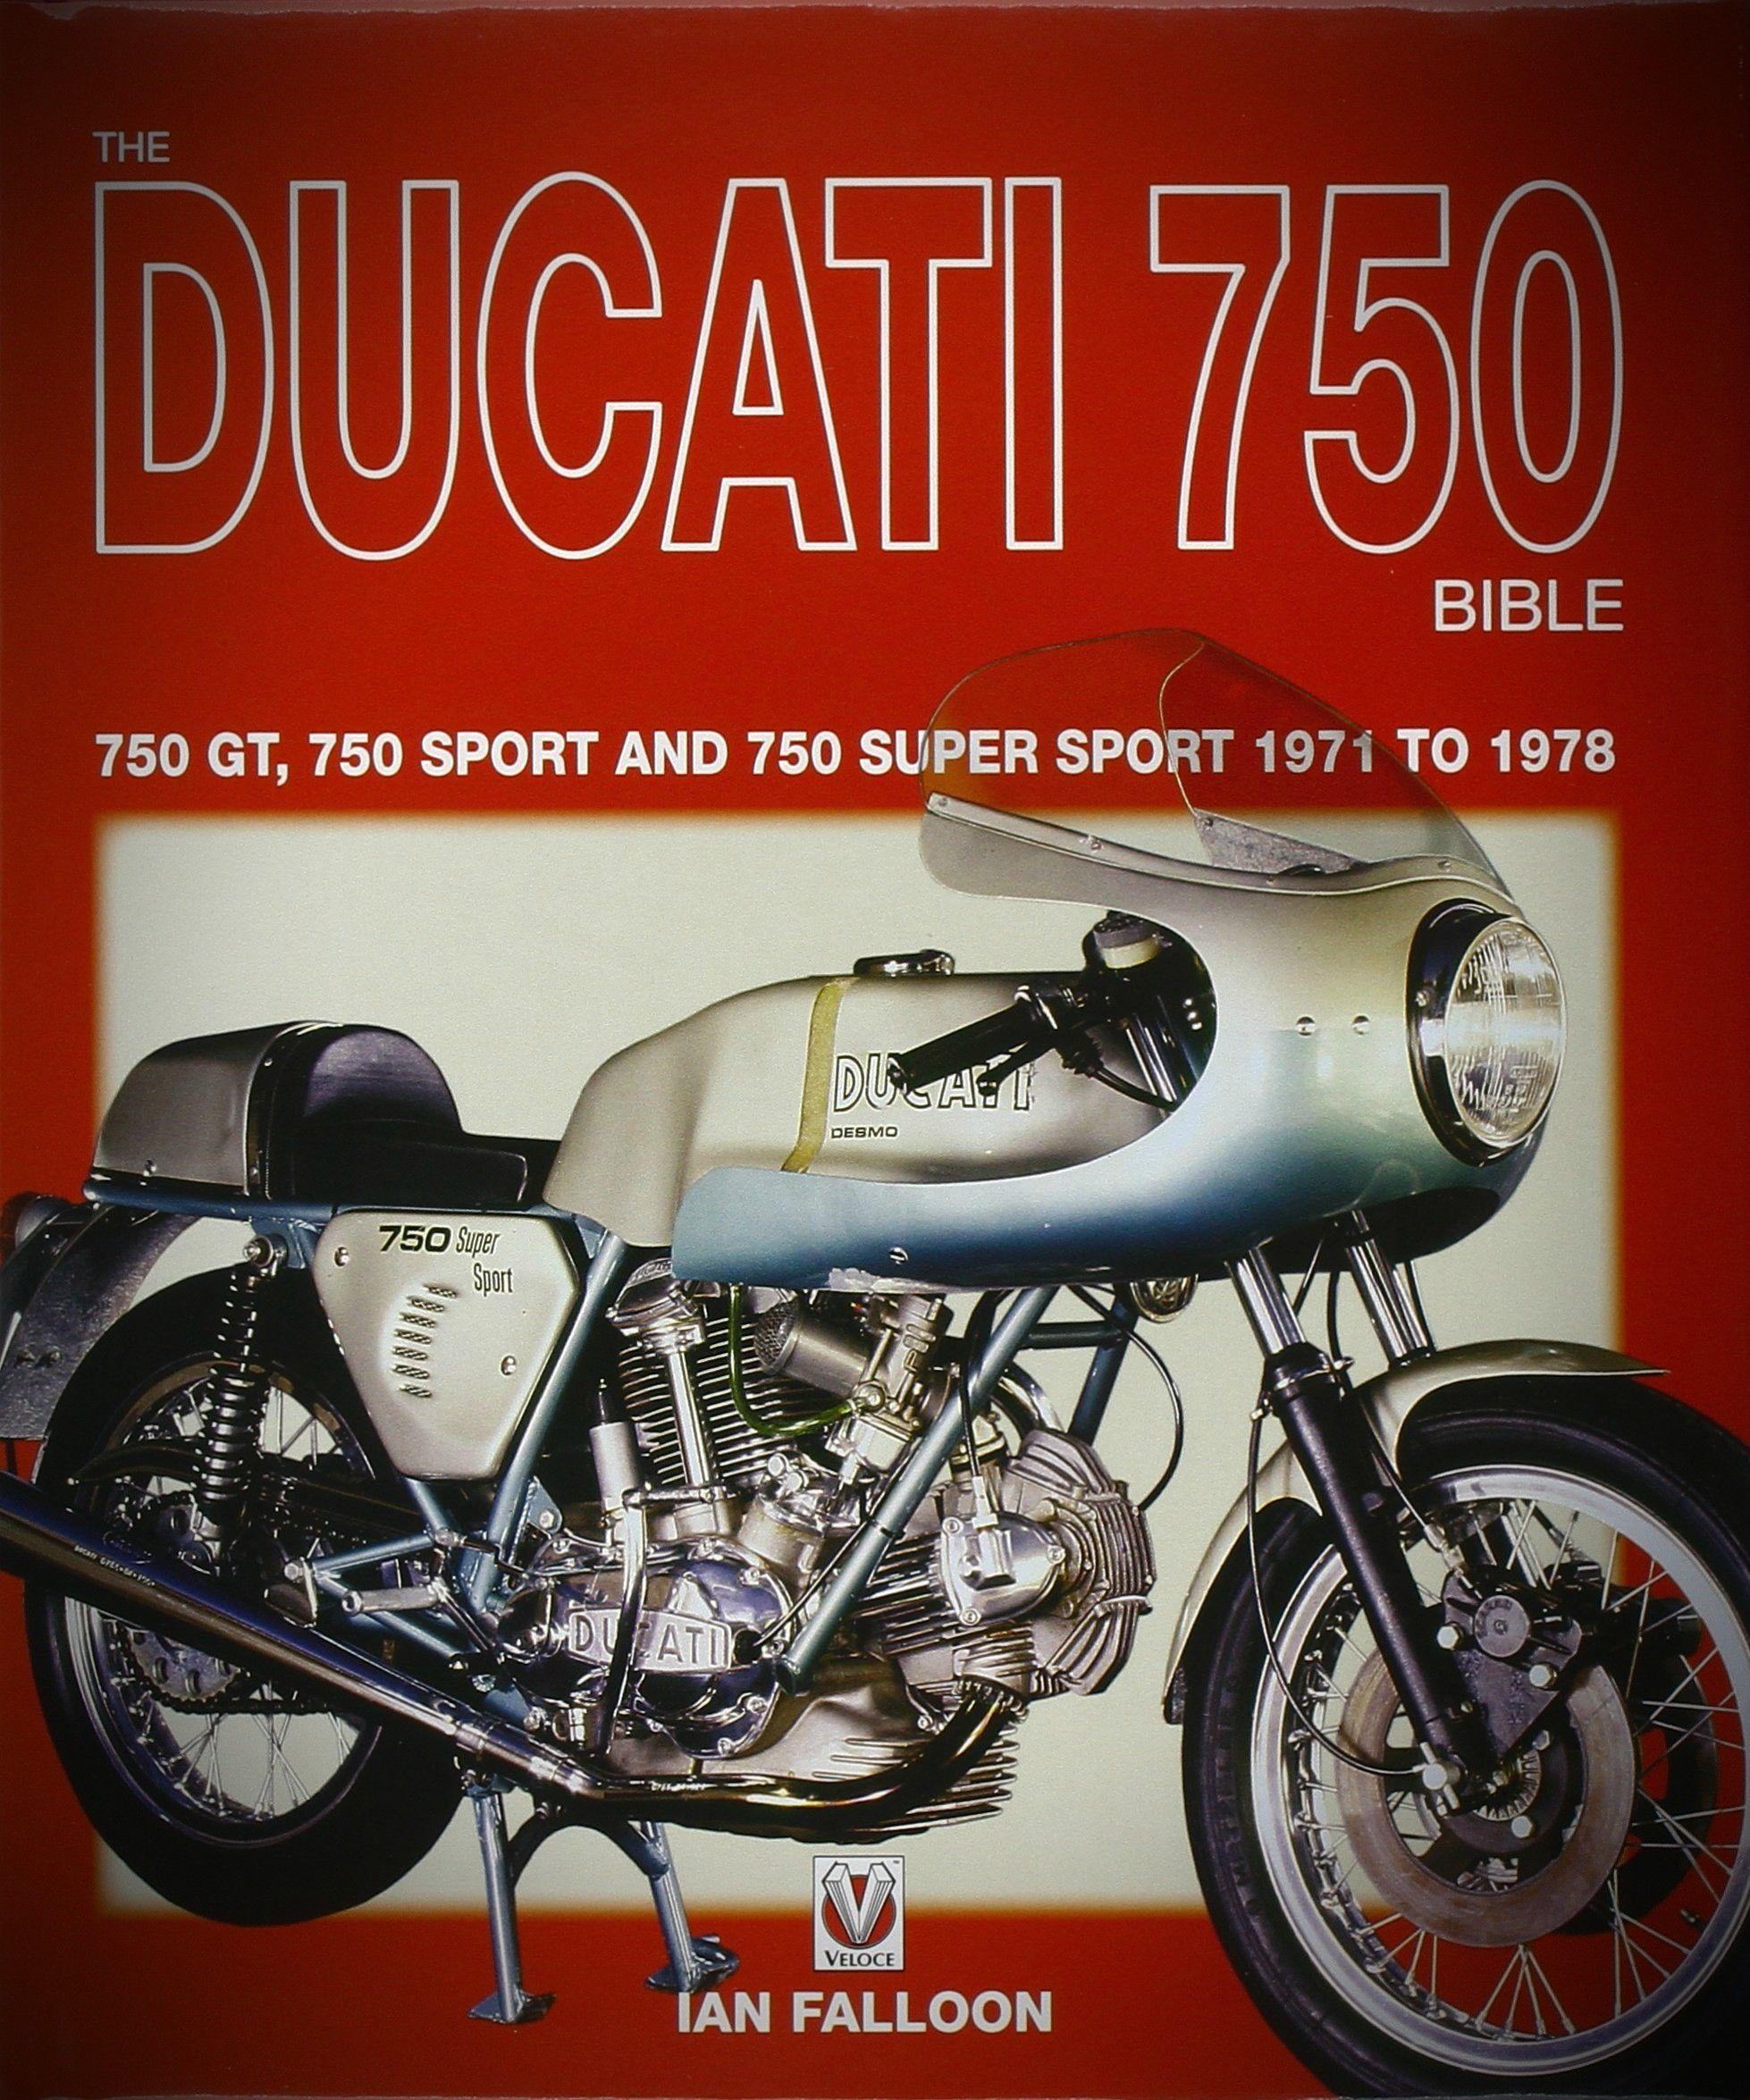 Ducati 750 Bible By Ian Falloon Depicting Classic Motorcycle